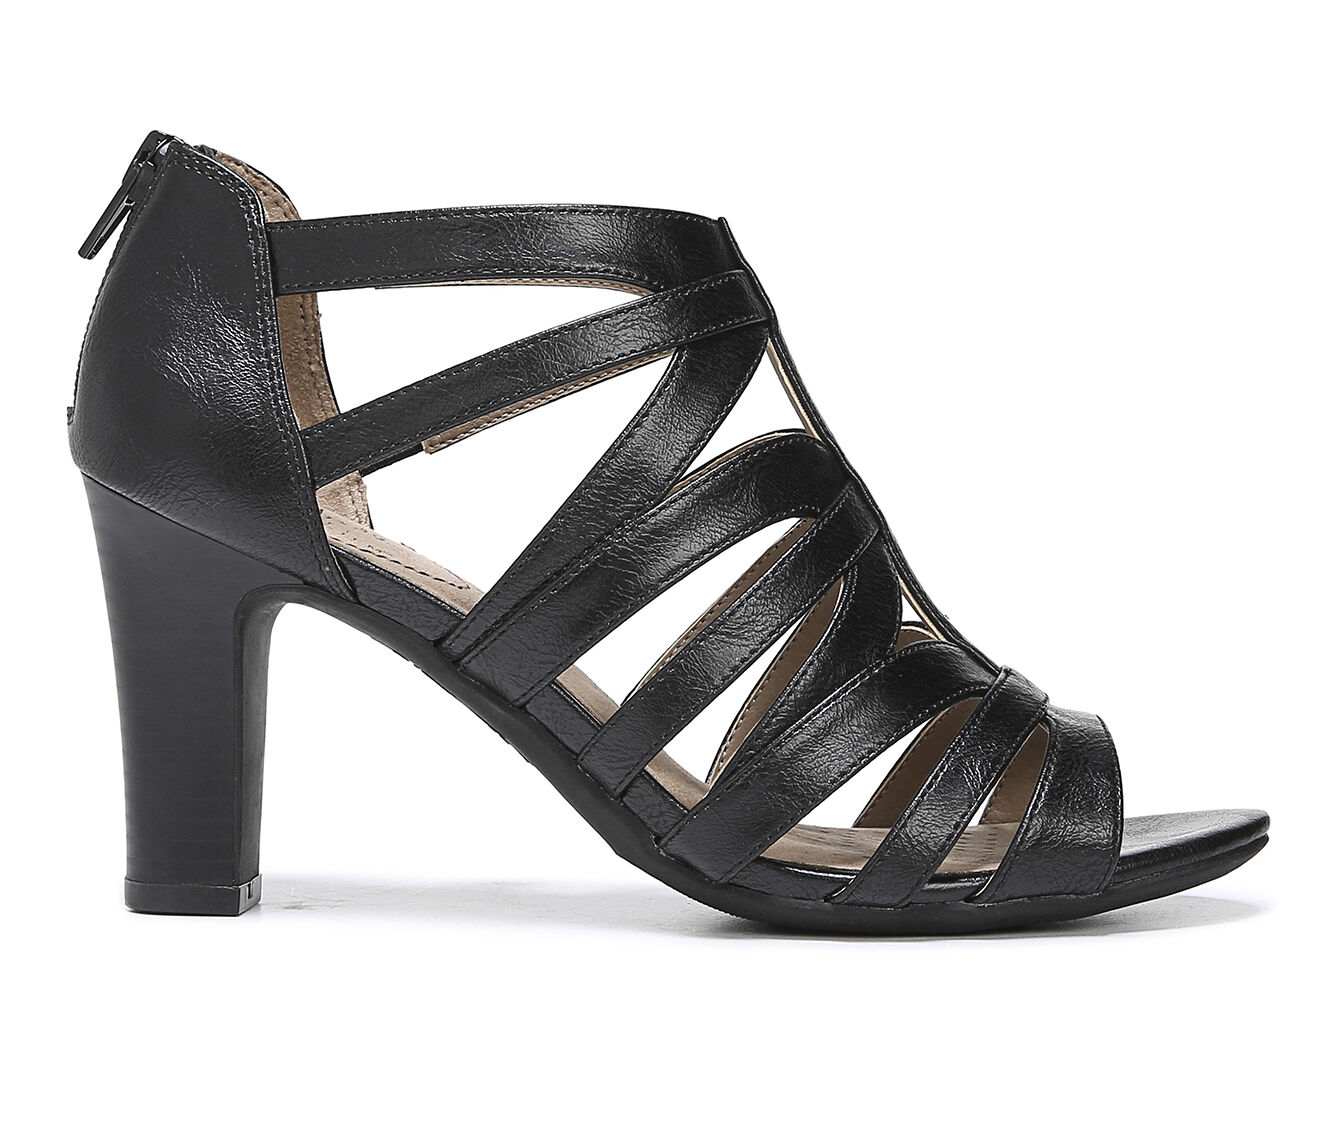 more discount Women's LifeStride Carter Dress Sandals Black